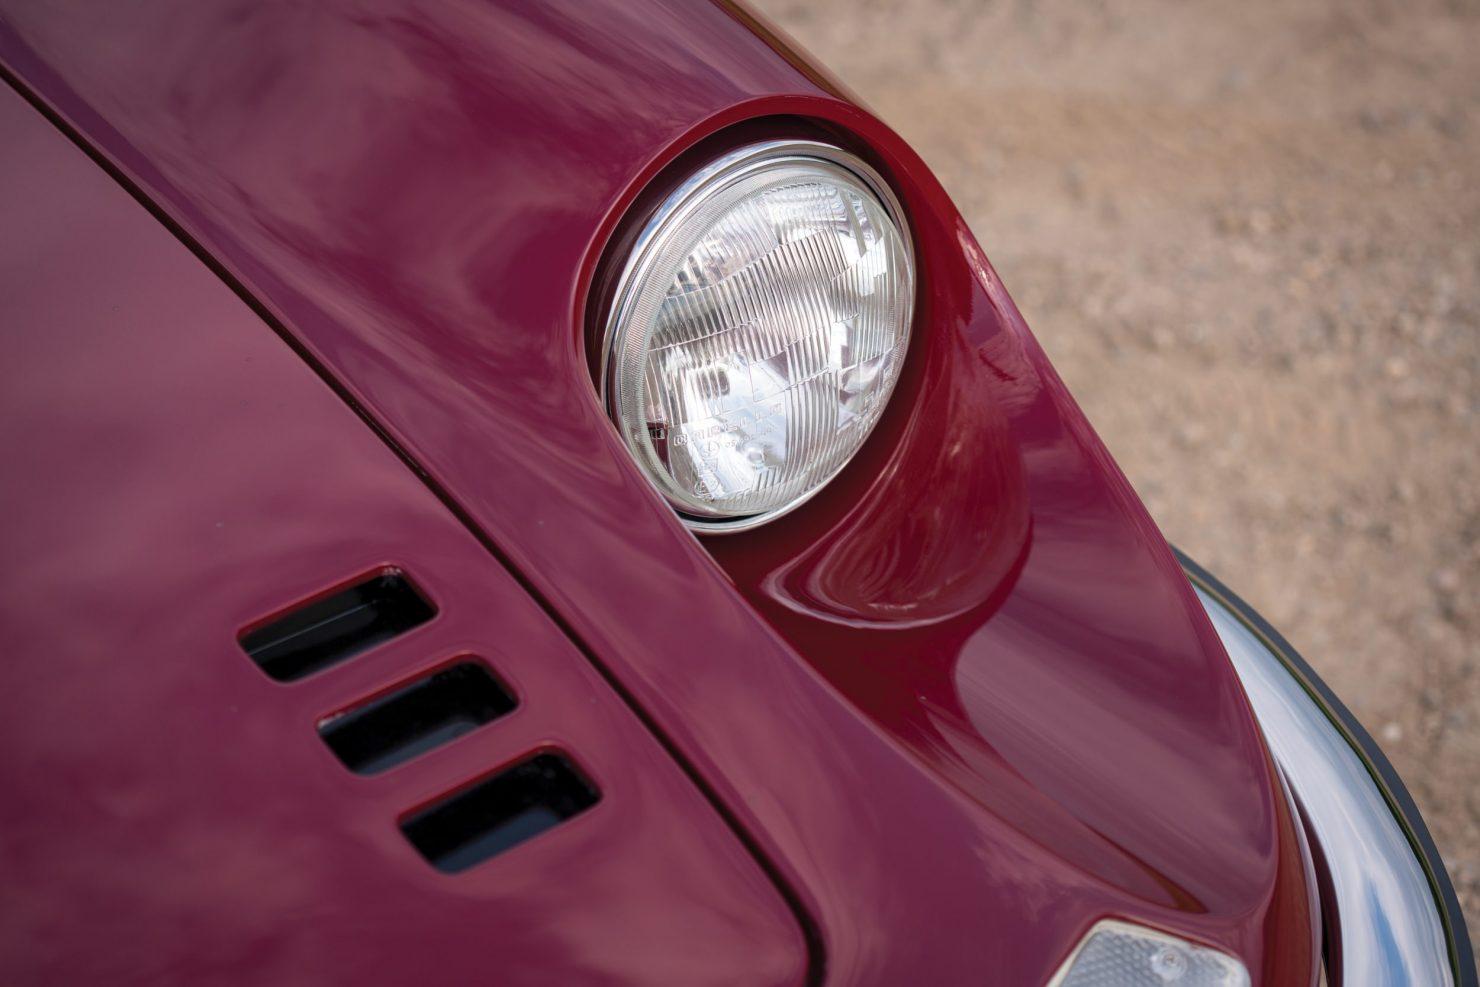 ferrari dino 246 19 1480x987 - 1969 Ferrari Dino 246 GT